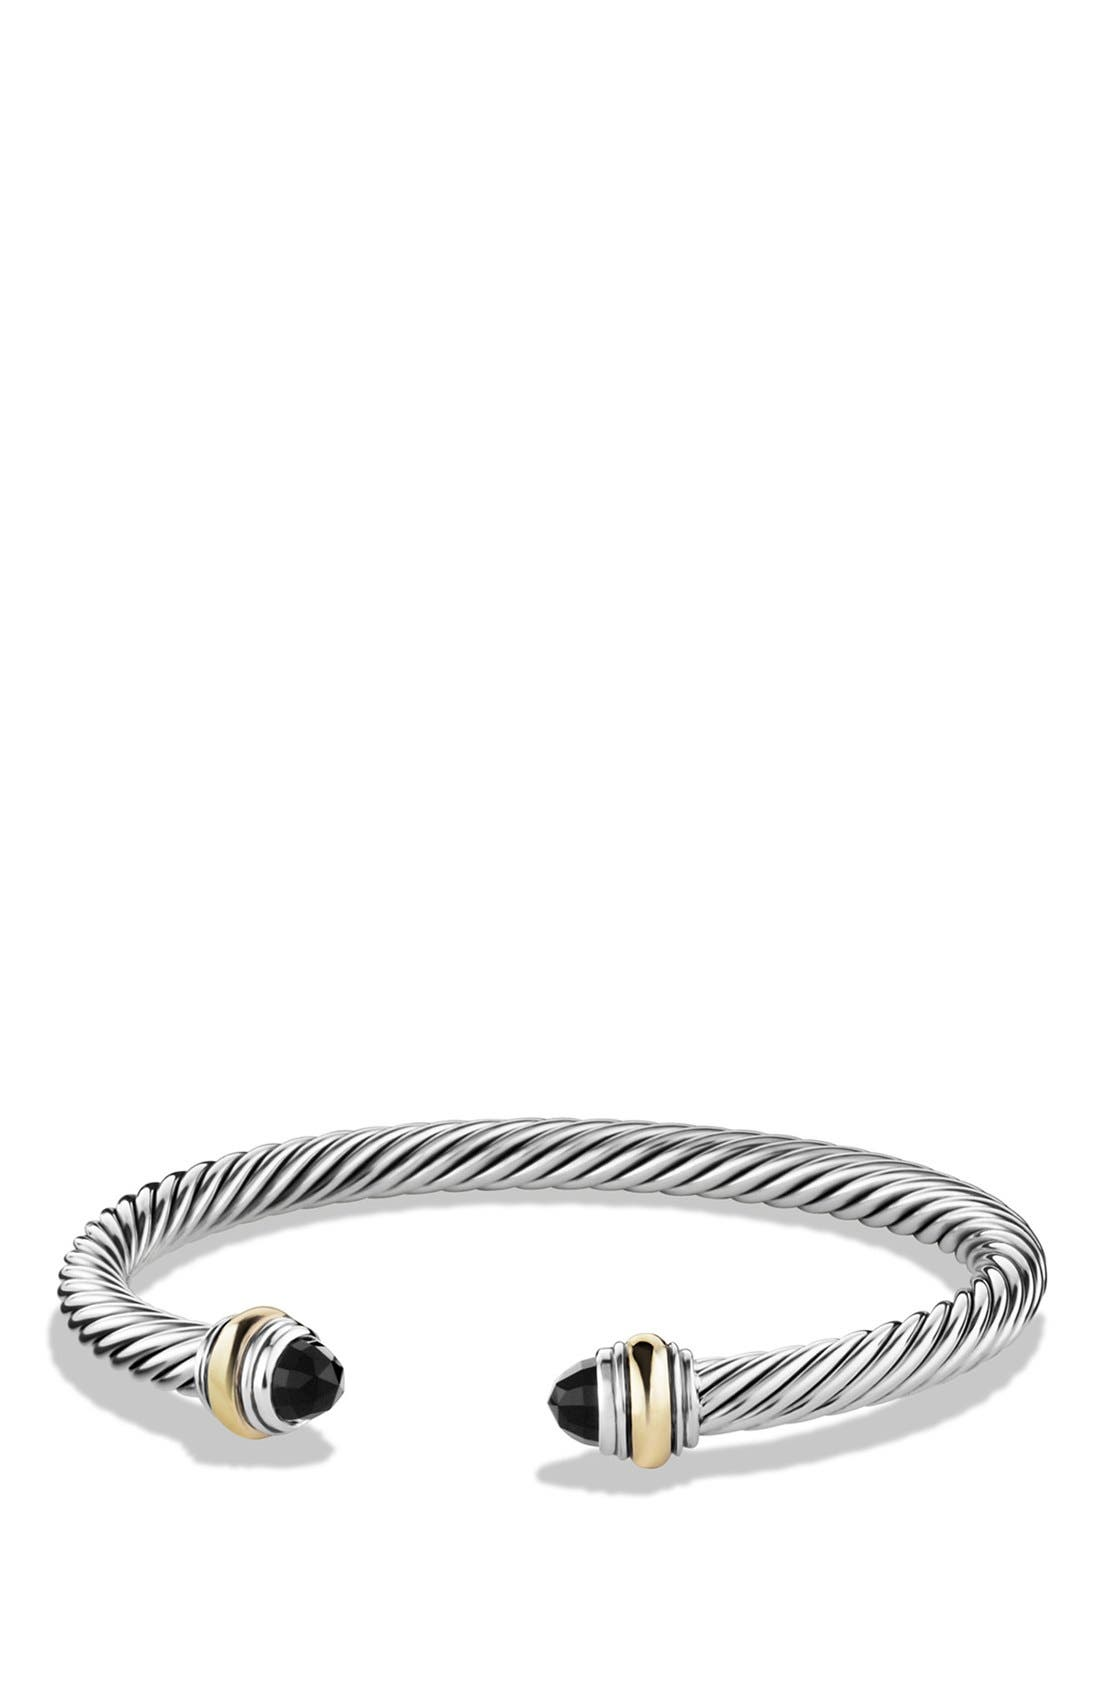 Main Image - David Yurman Cable Classics Bracelet with Semiprecious Stones & 14K Gold Accent, 5mm